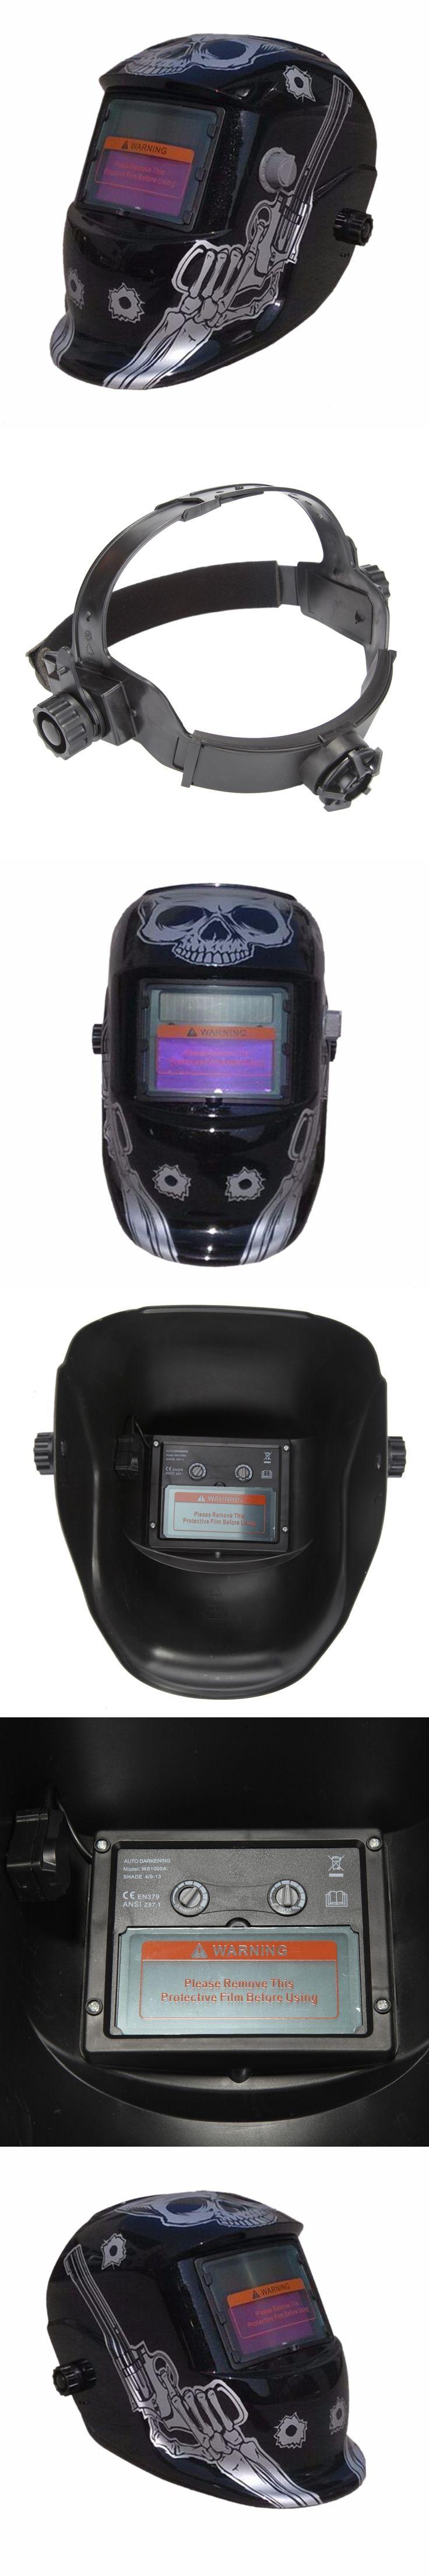 Solar Auto Darkening TIG MIG MMA Electric Welding Mask Helmet Welder Cap Lens for Welding Machine OR Plasma Cutter